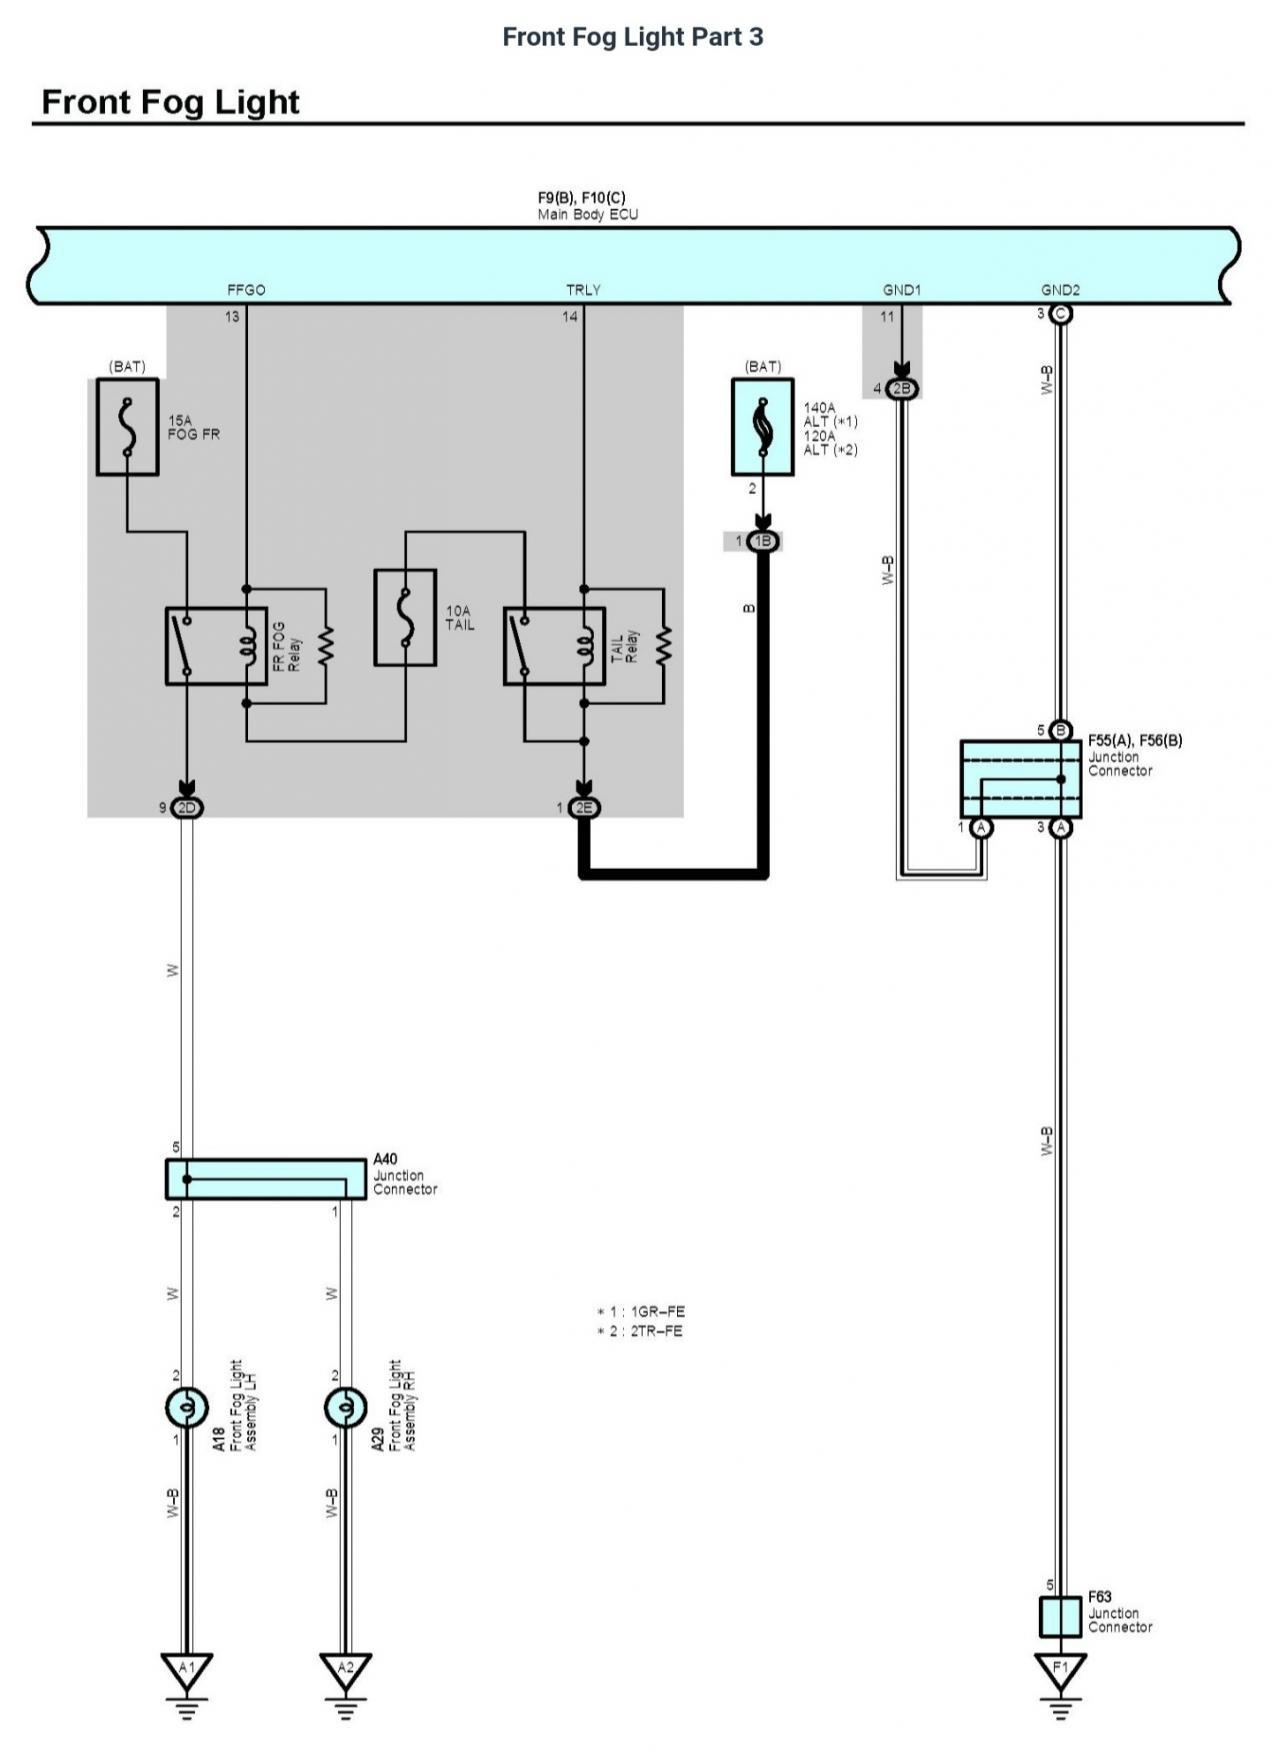 Fog Light Electrical Problem-screenshot_20210707-154758_chrome-jpg